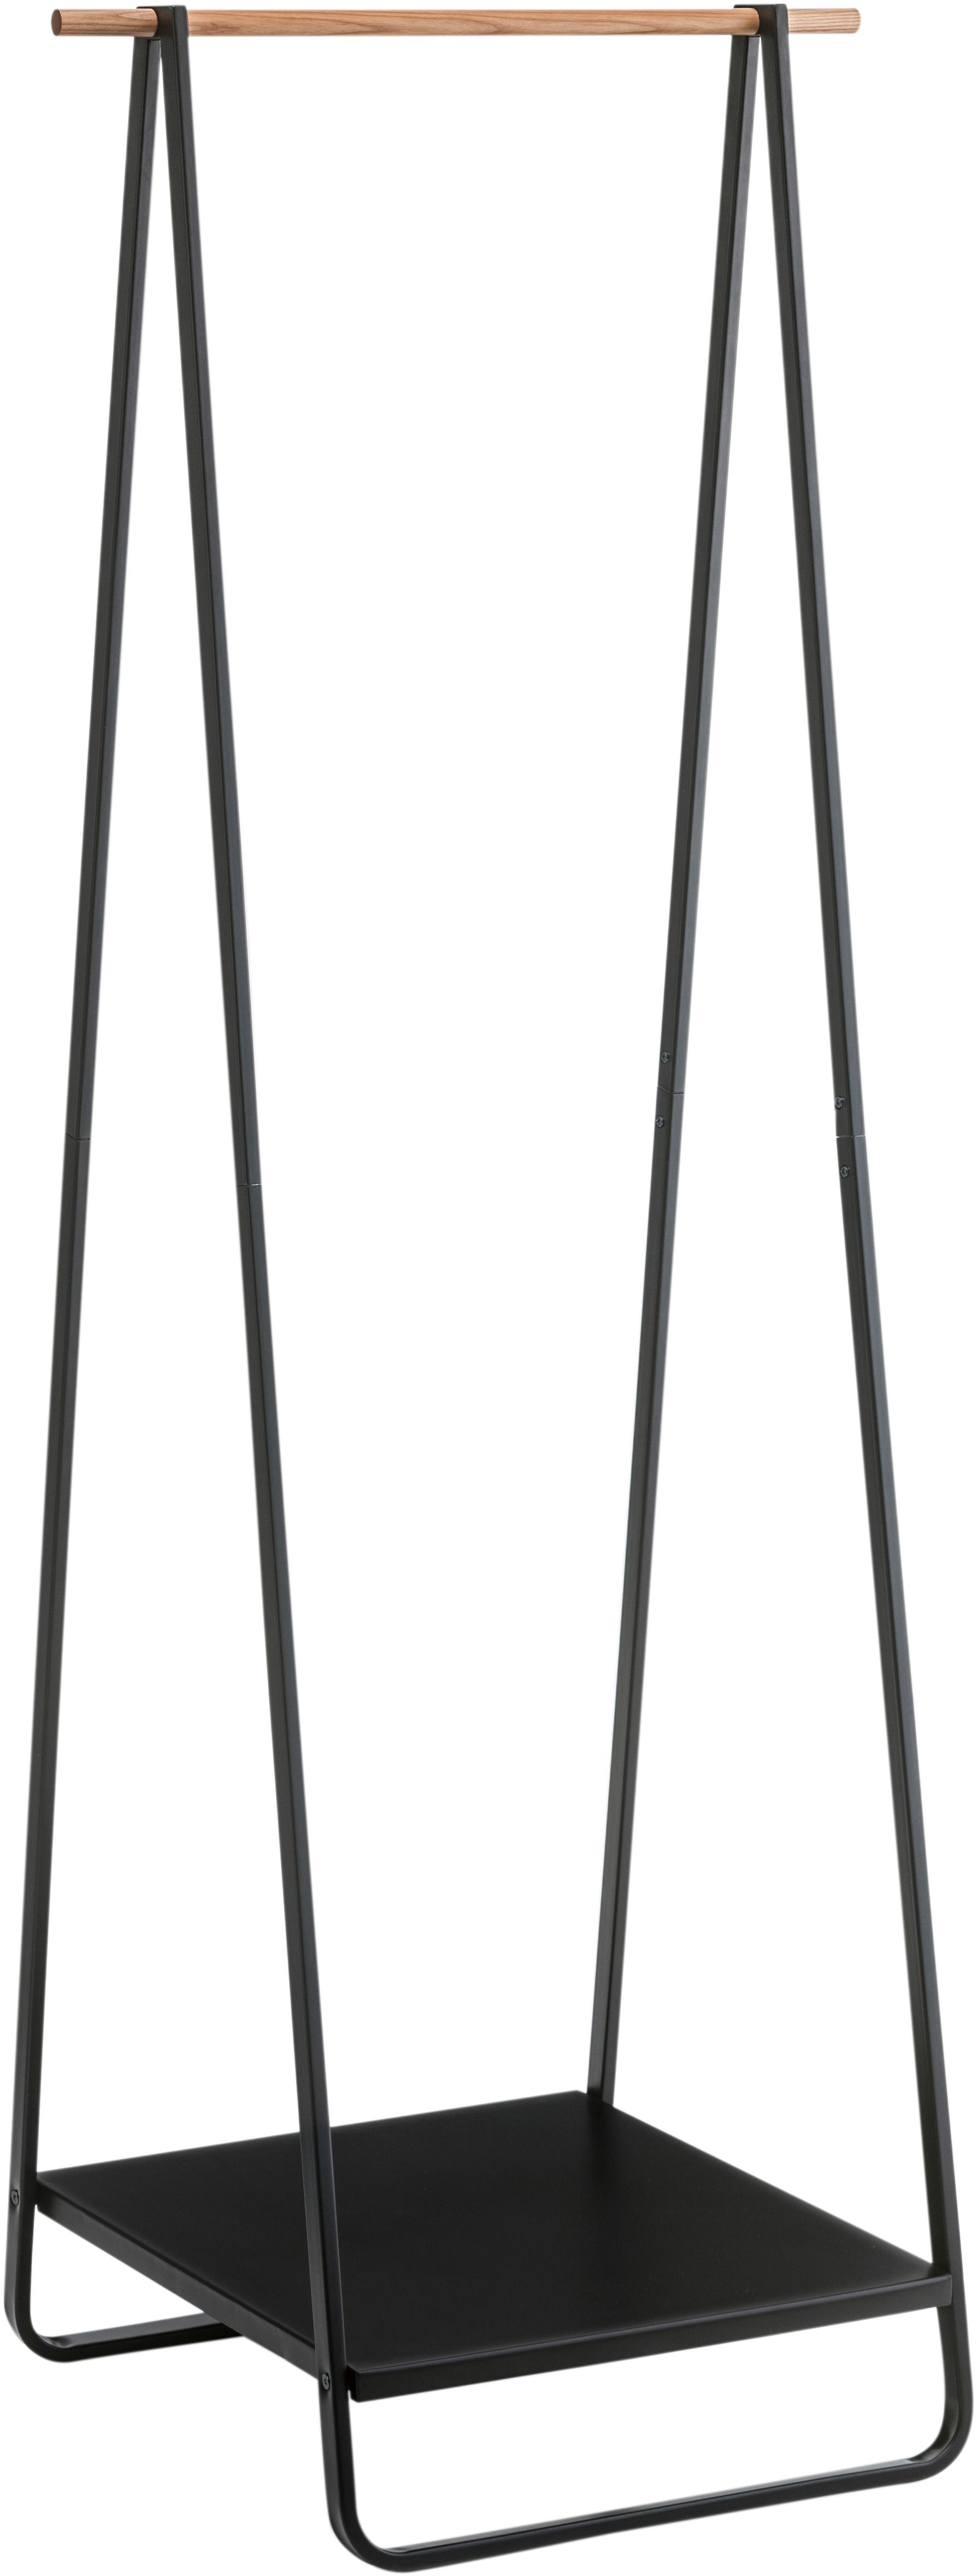 Kledingstang Tatjana, Staal, hout, Zwart, houtkleurig, 52 x 140 cm